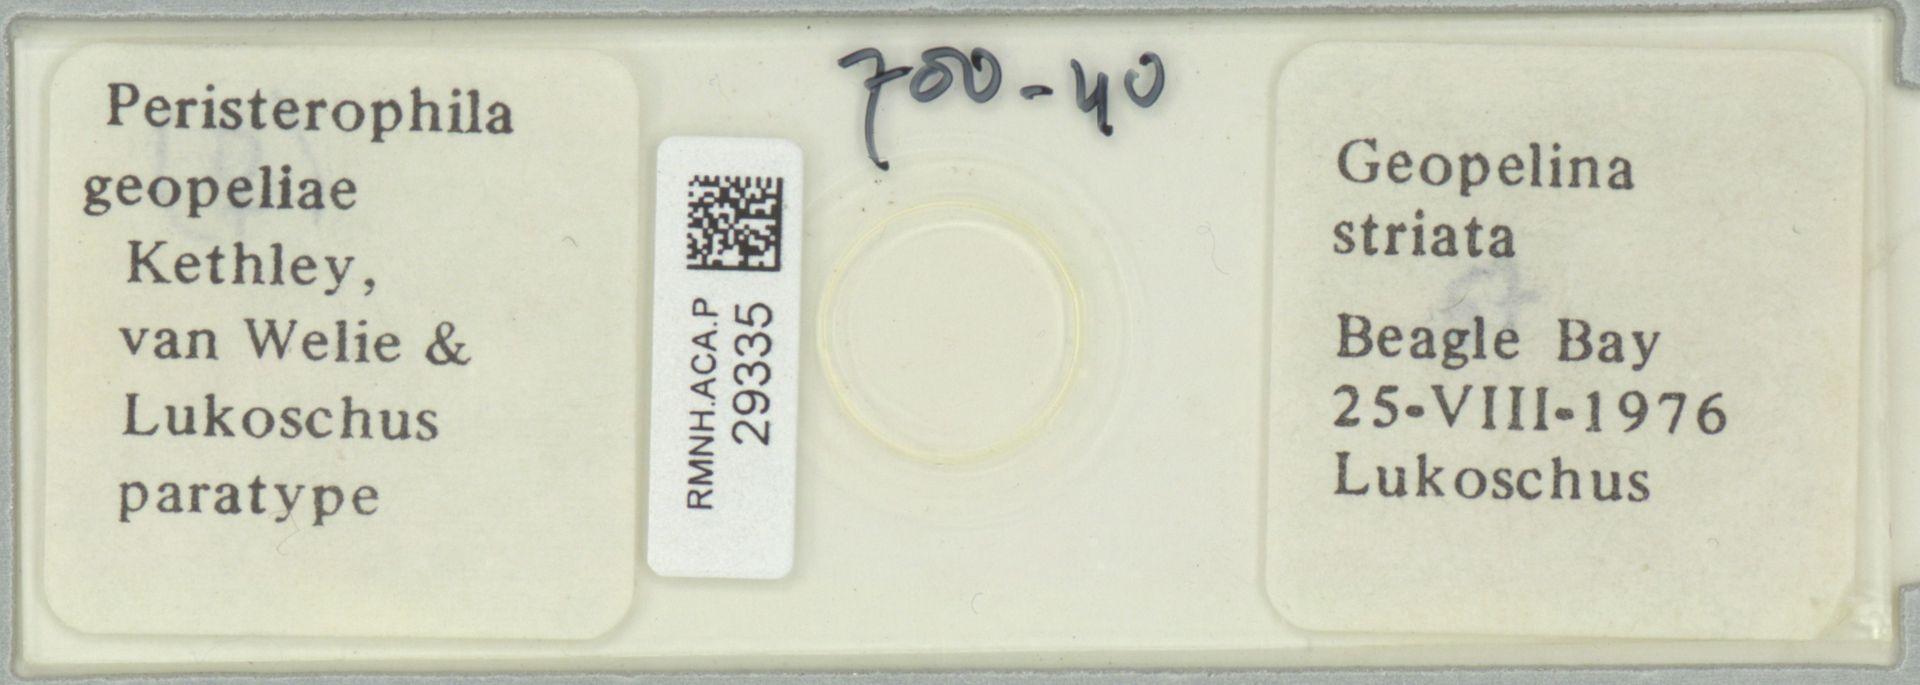 RMNH.ACA.P.29335 | Peristerophila geopeliae Kethly, van Welie & Lukoschus